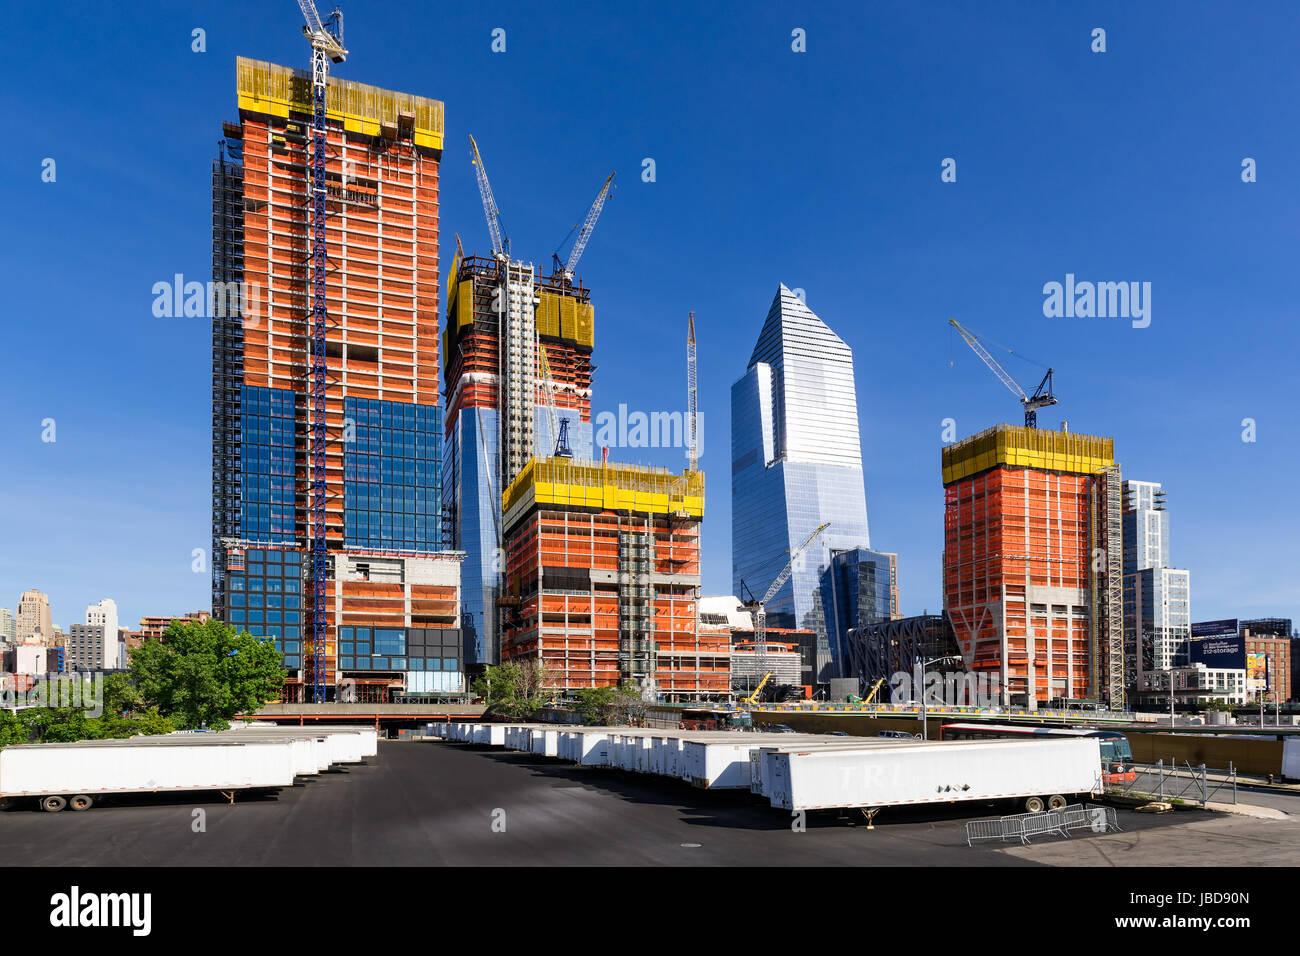 Der Hudson Yards Baustelle (2017). Midtown Manhattan, New York City Stockbild